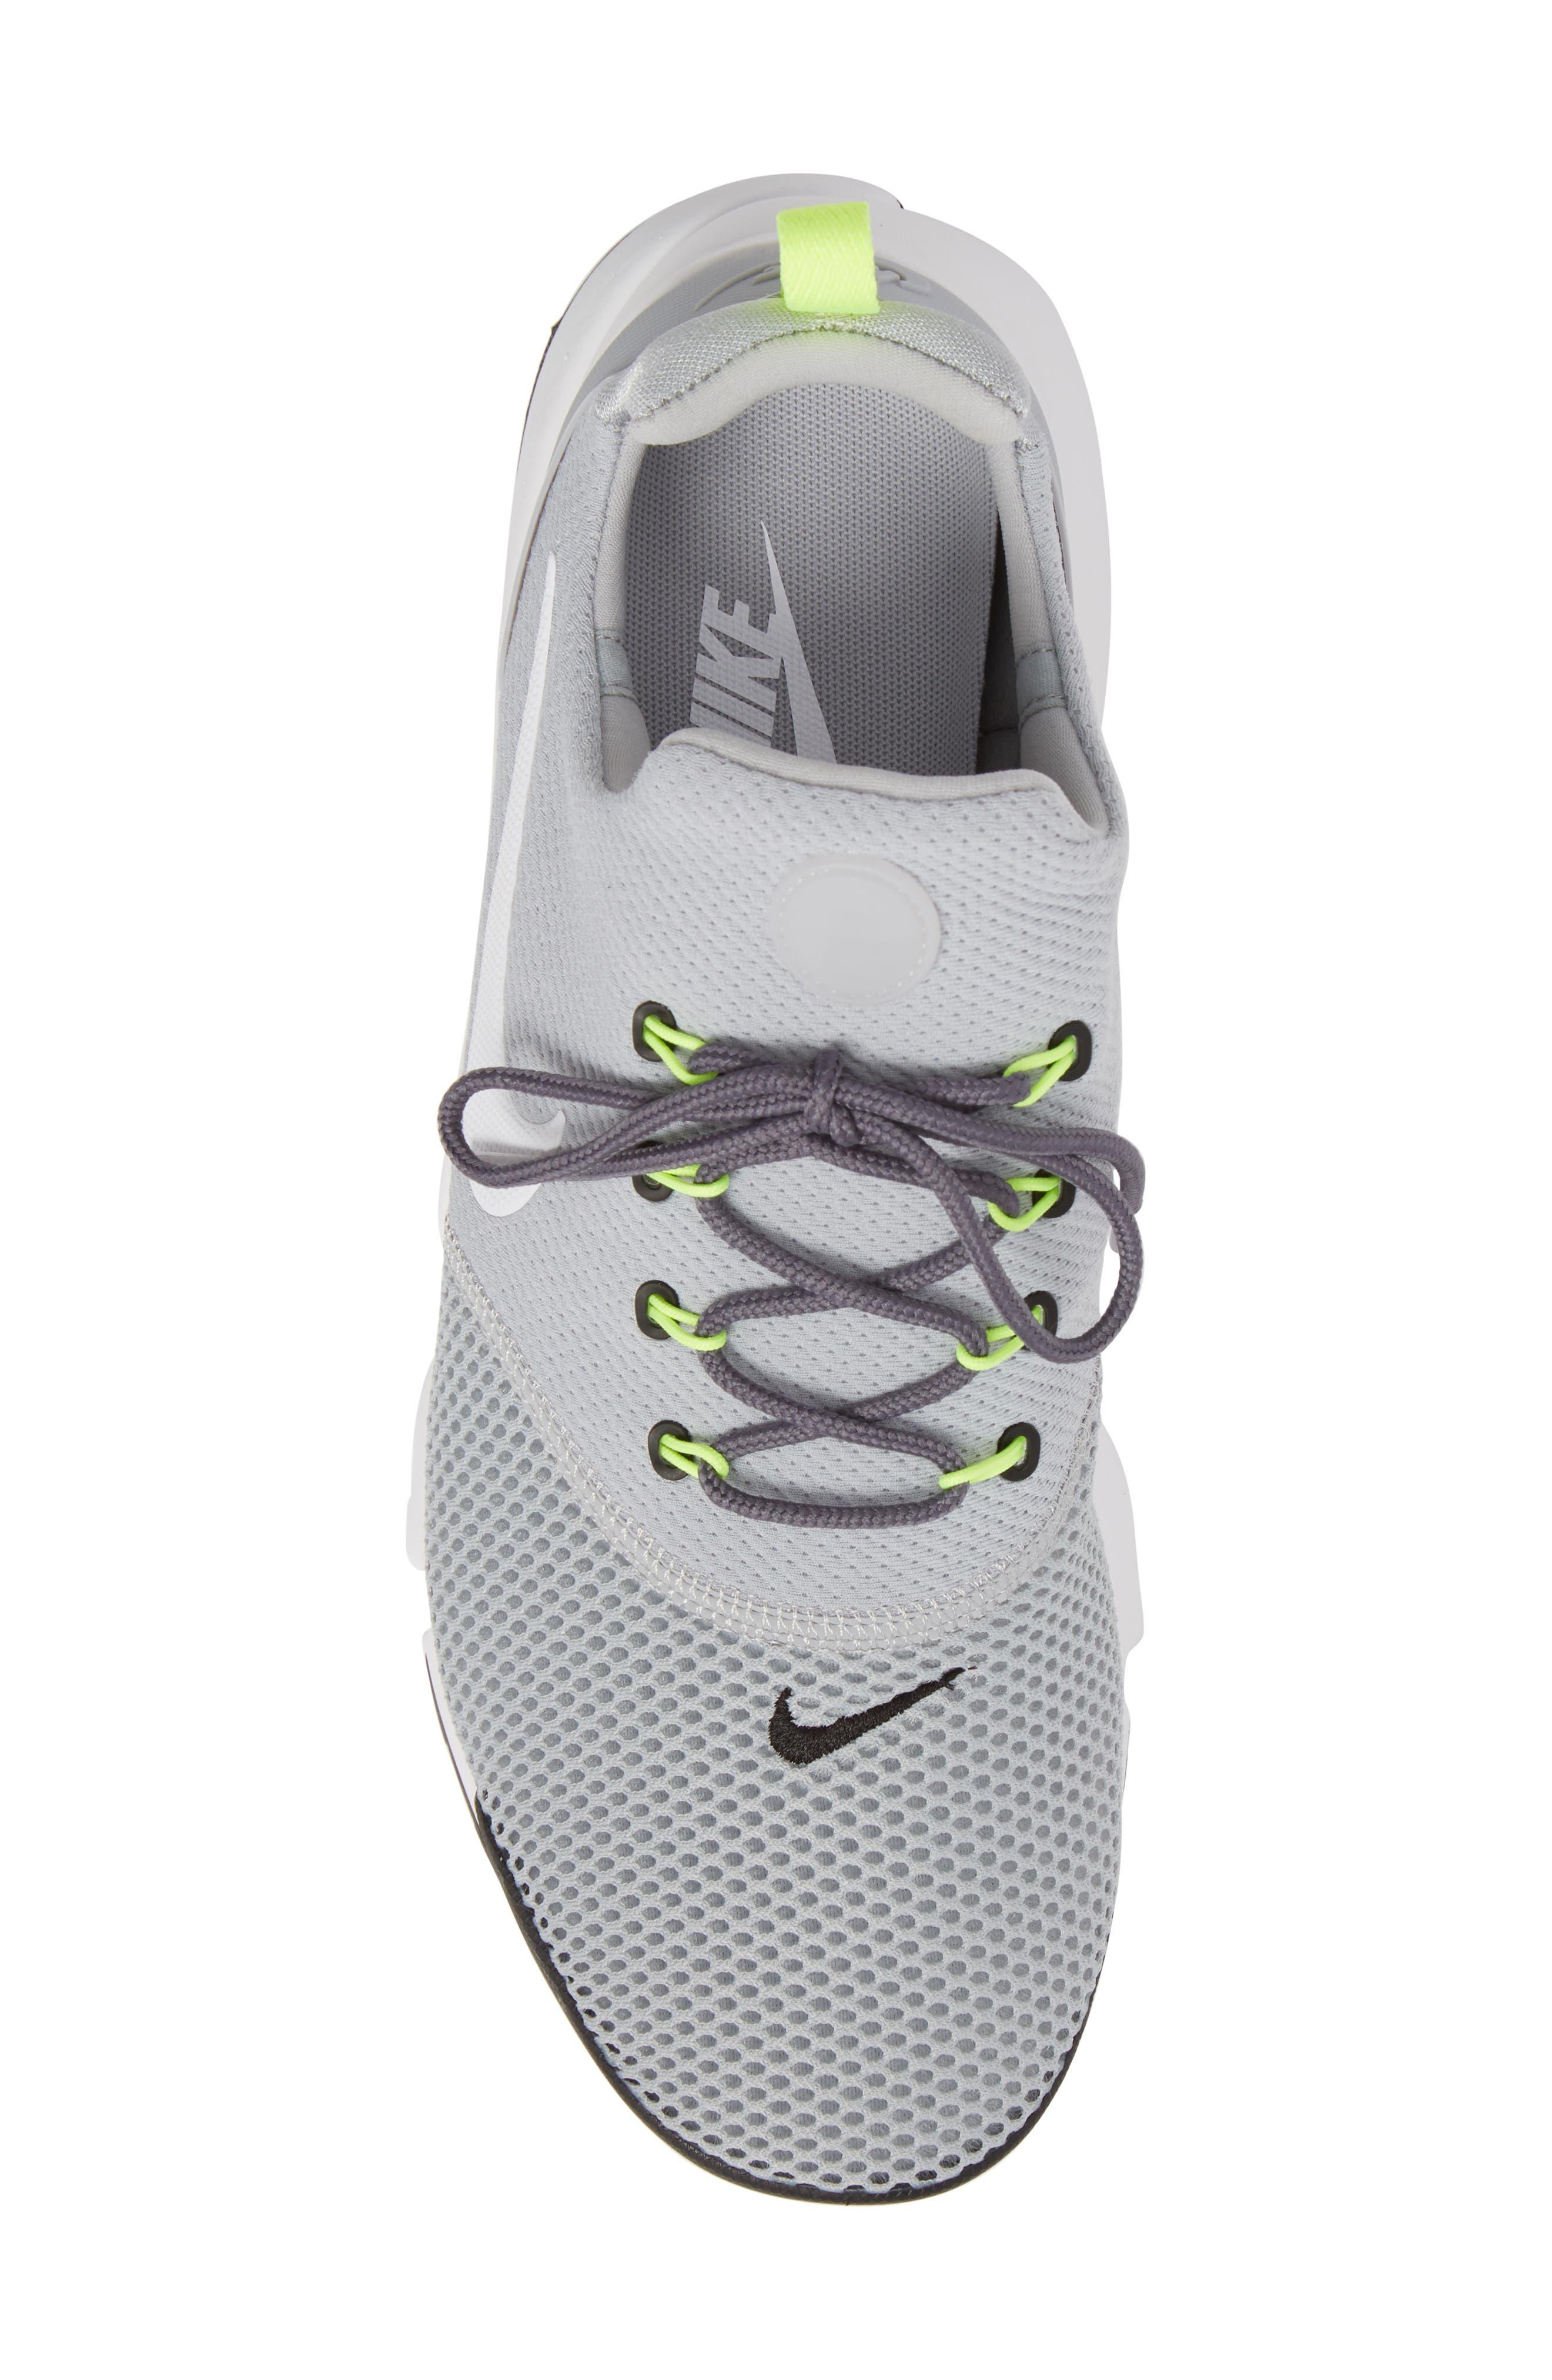 Presto Fly Sneaker,                             Alternate thumbnail 5, color,                             Wolf Grey/ White/ Volt